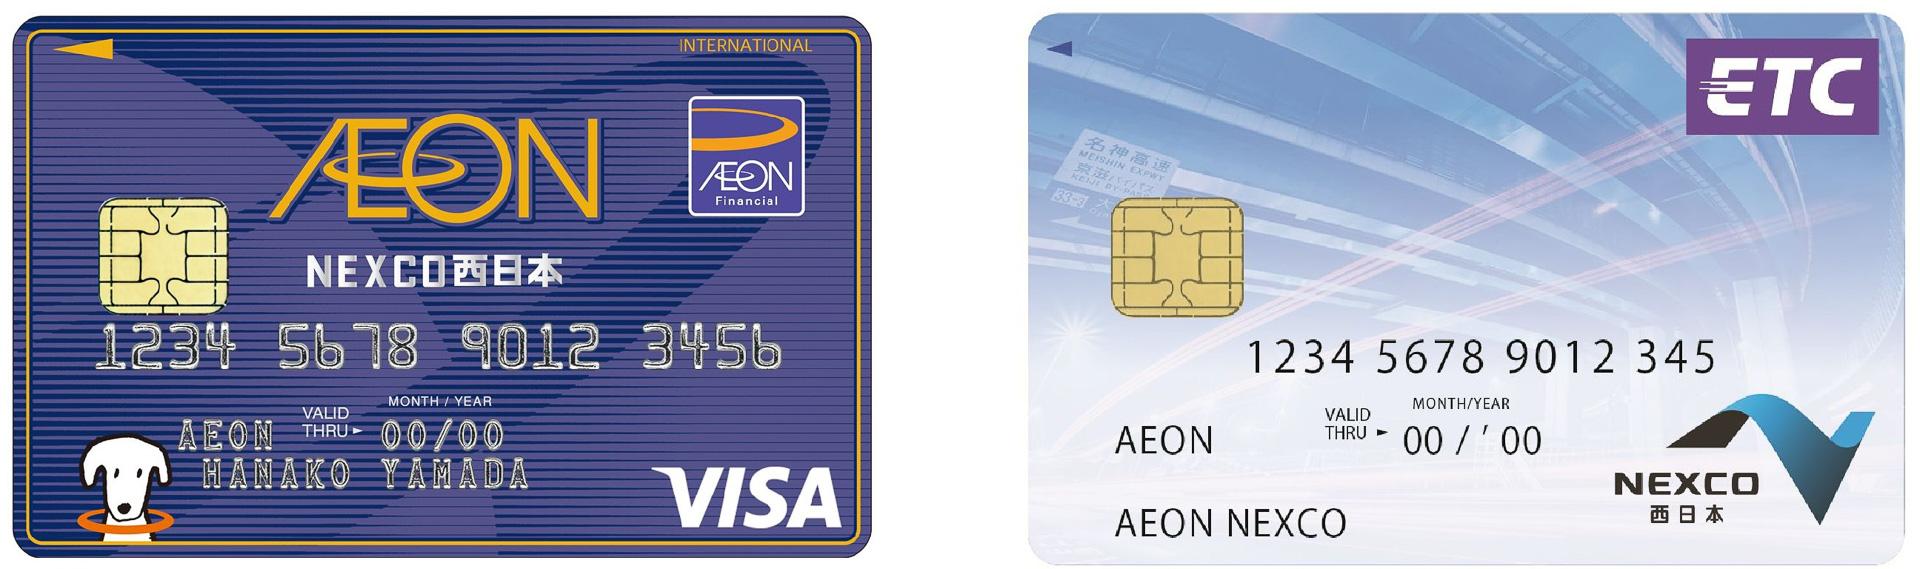 Etc イオン カード